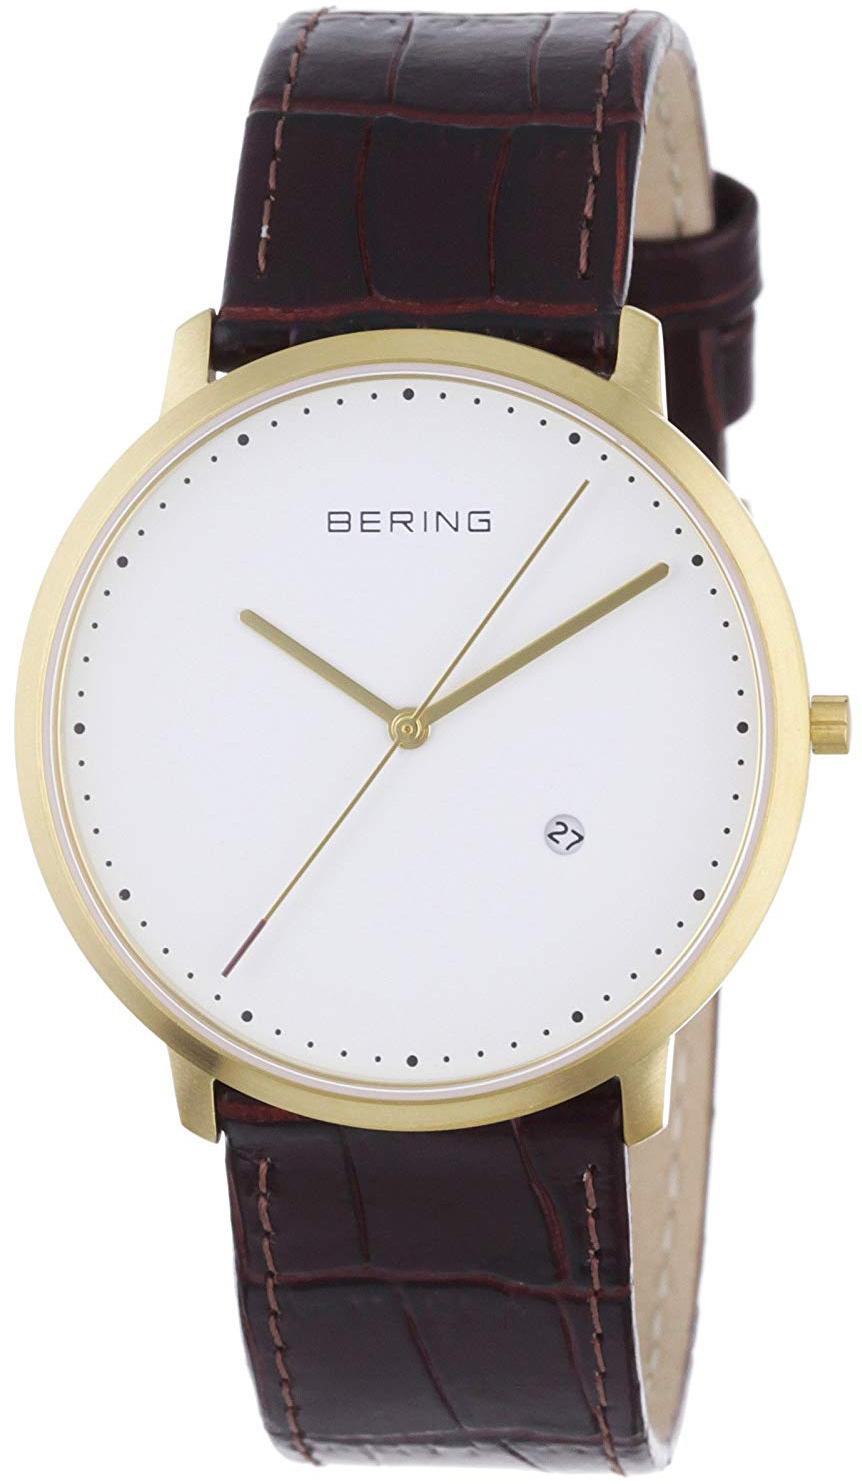 Bering Classic Herreklokke 11139-534 Hvit/Lær Ø39 mm - Bering